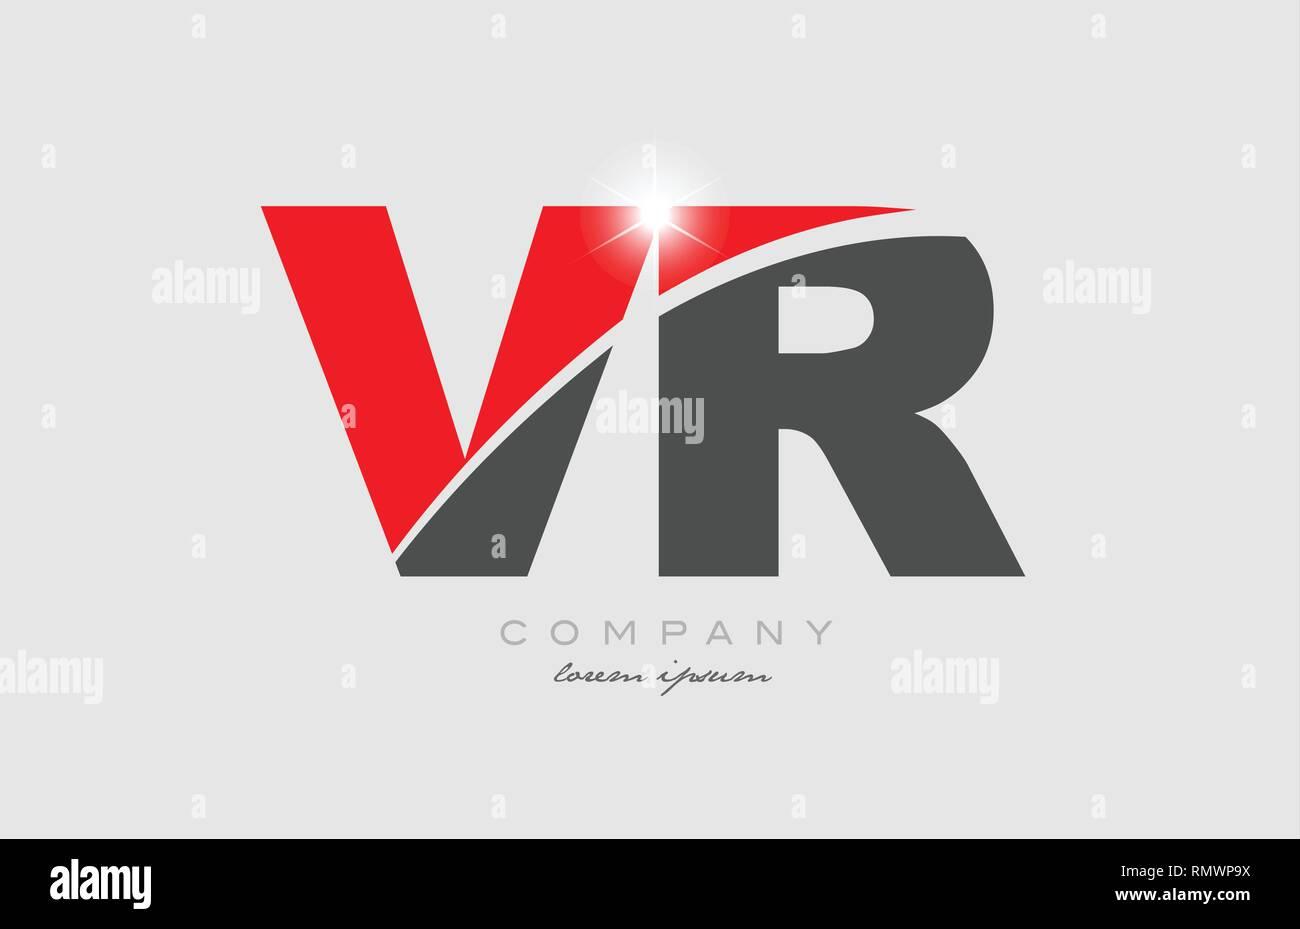 Combination Letter Vr V R In Grey Red Color Alphabet Logo Icon